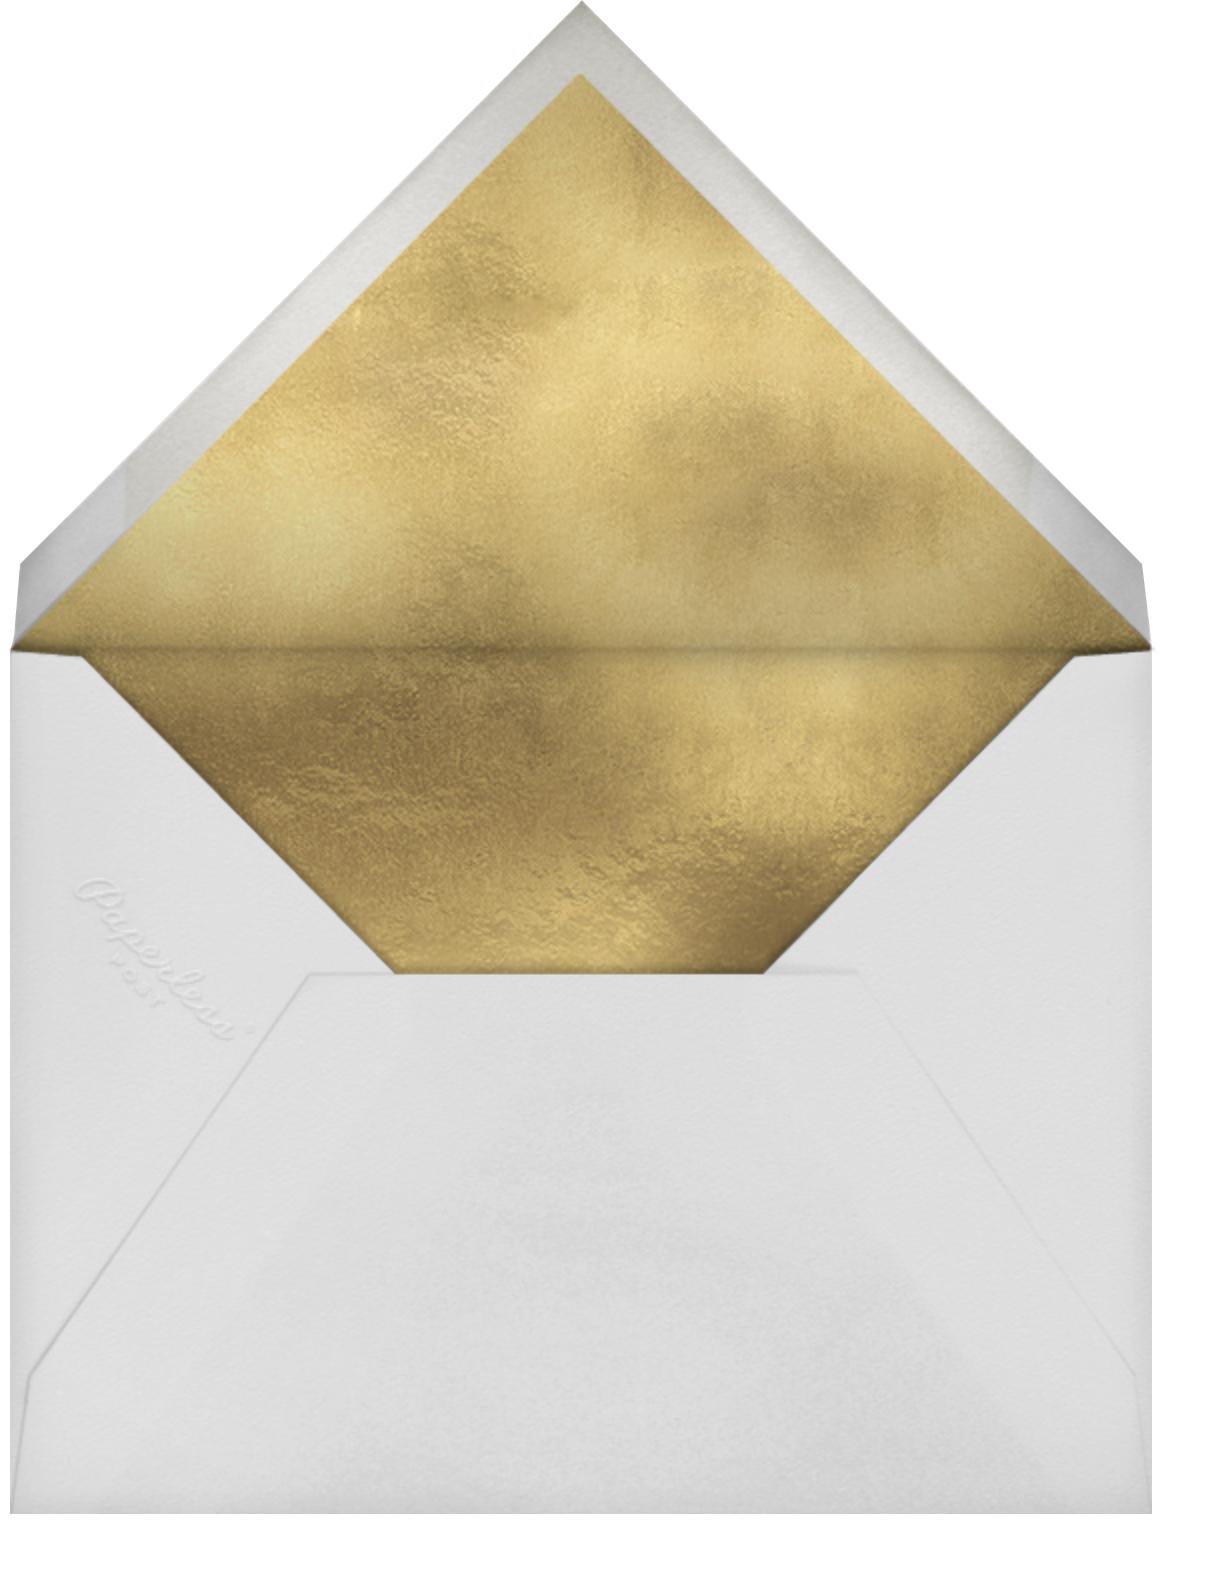 Lace Garden (Invitation) - Hunter Green - kate spade new york - All - envelope back